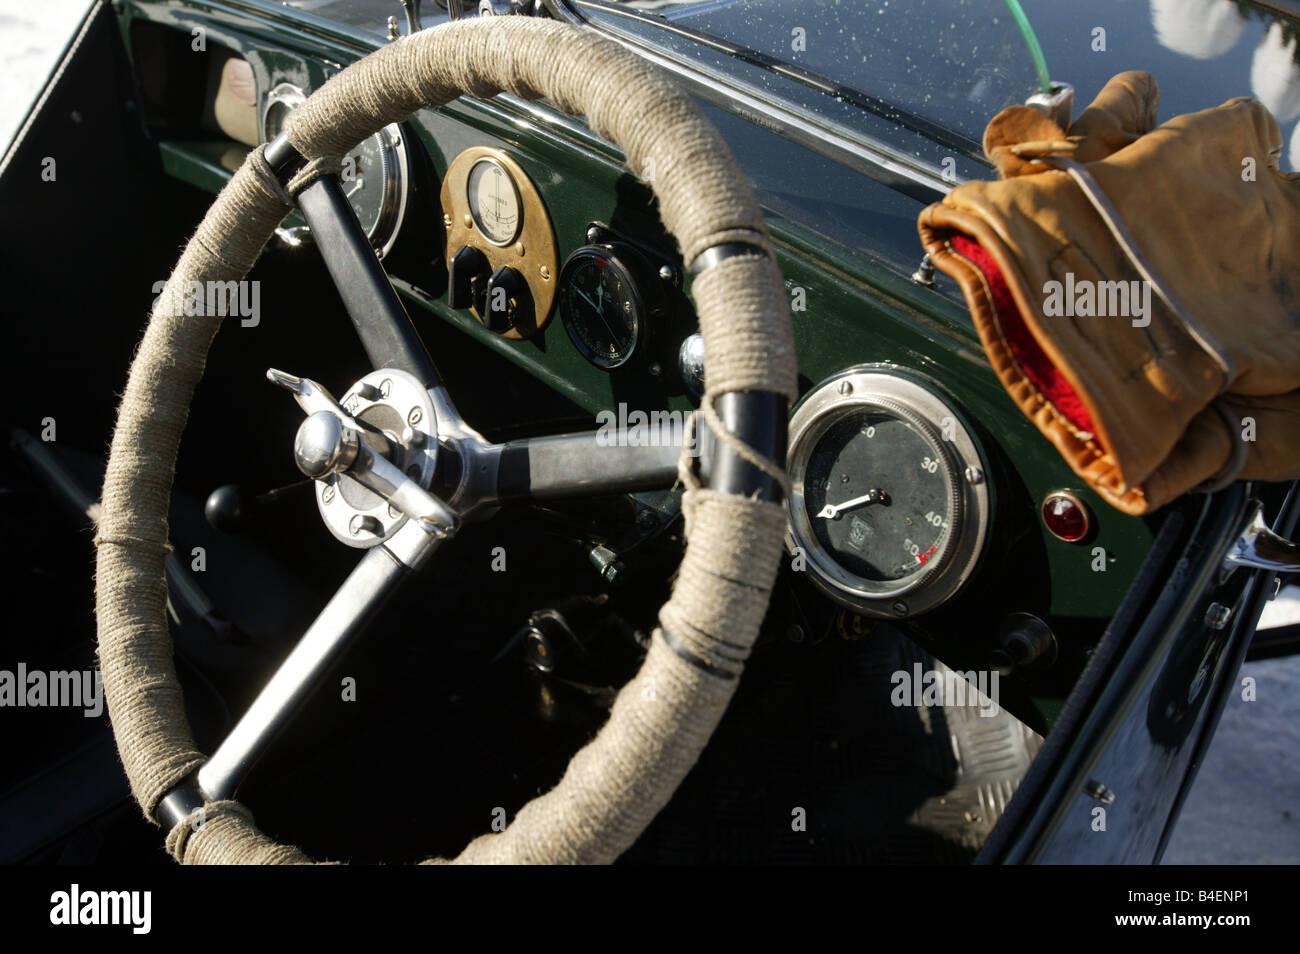 Auto, Oldtimer, Detail, details, Cockpit, Lenkrad, Technik ...